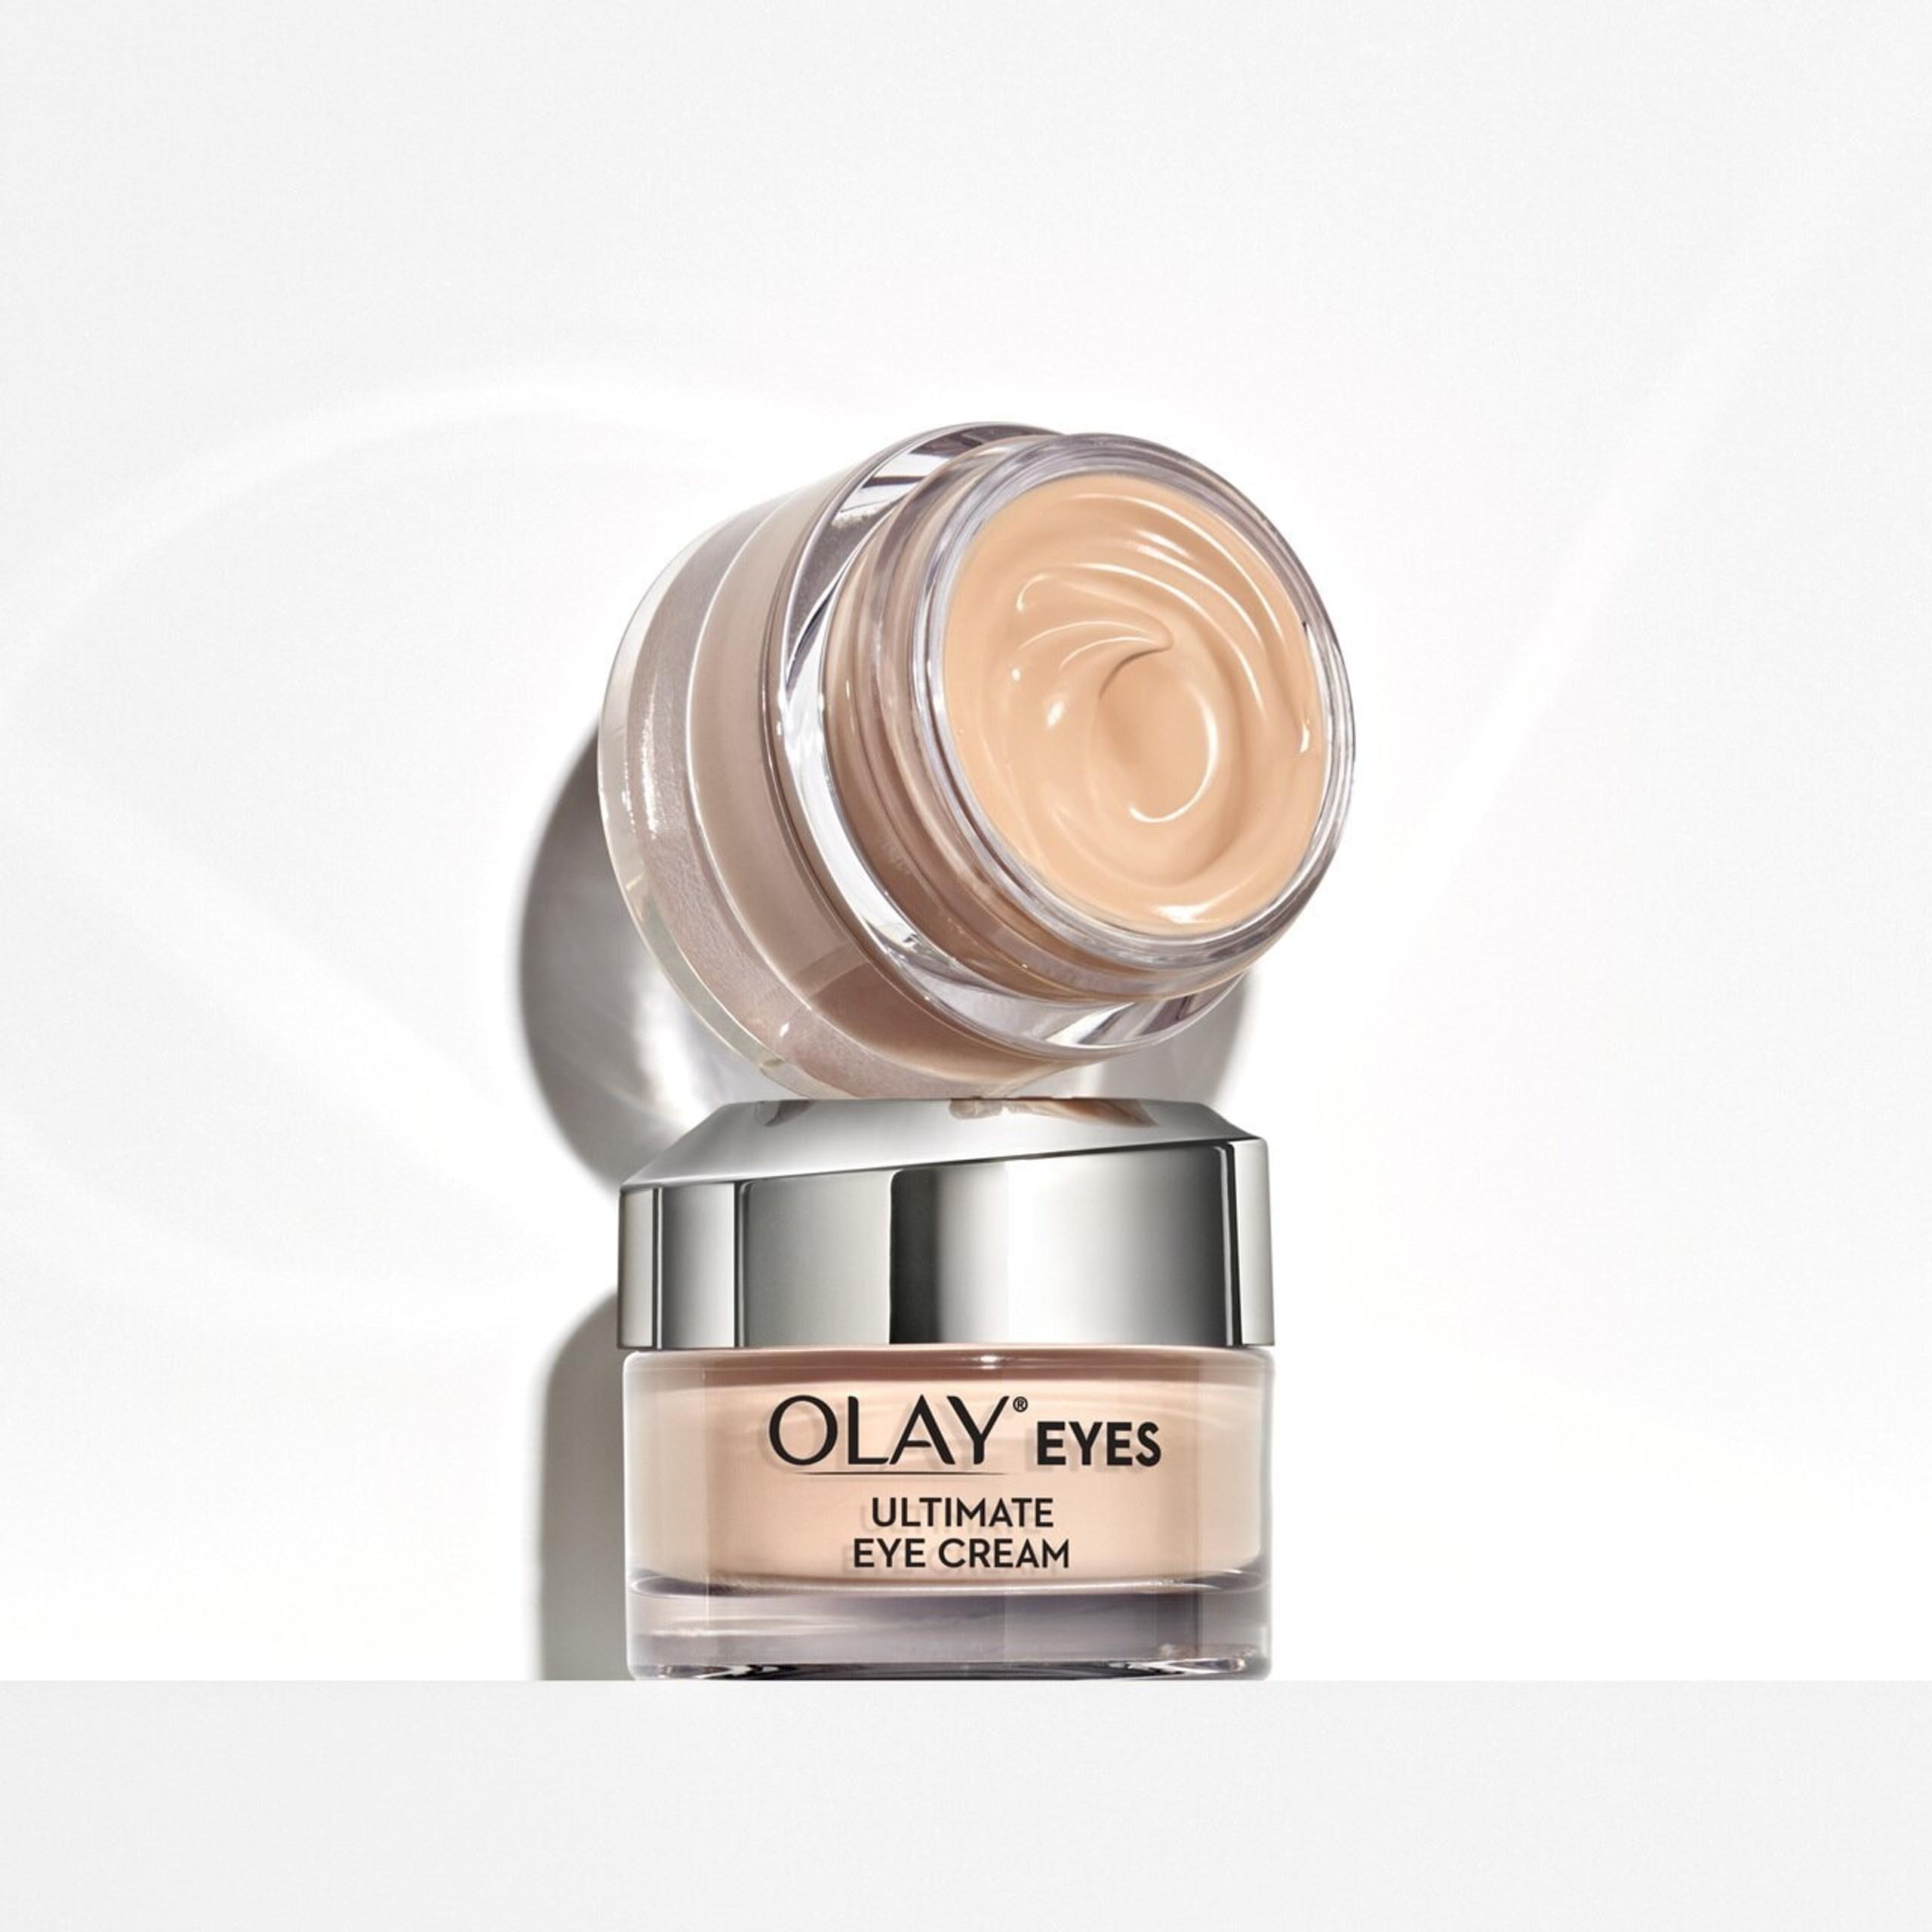 Olay - Ultimate Eye Cream For Wrinkles, Puffy Eyes & Dark Circles